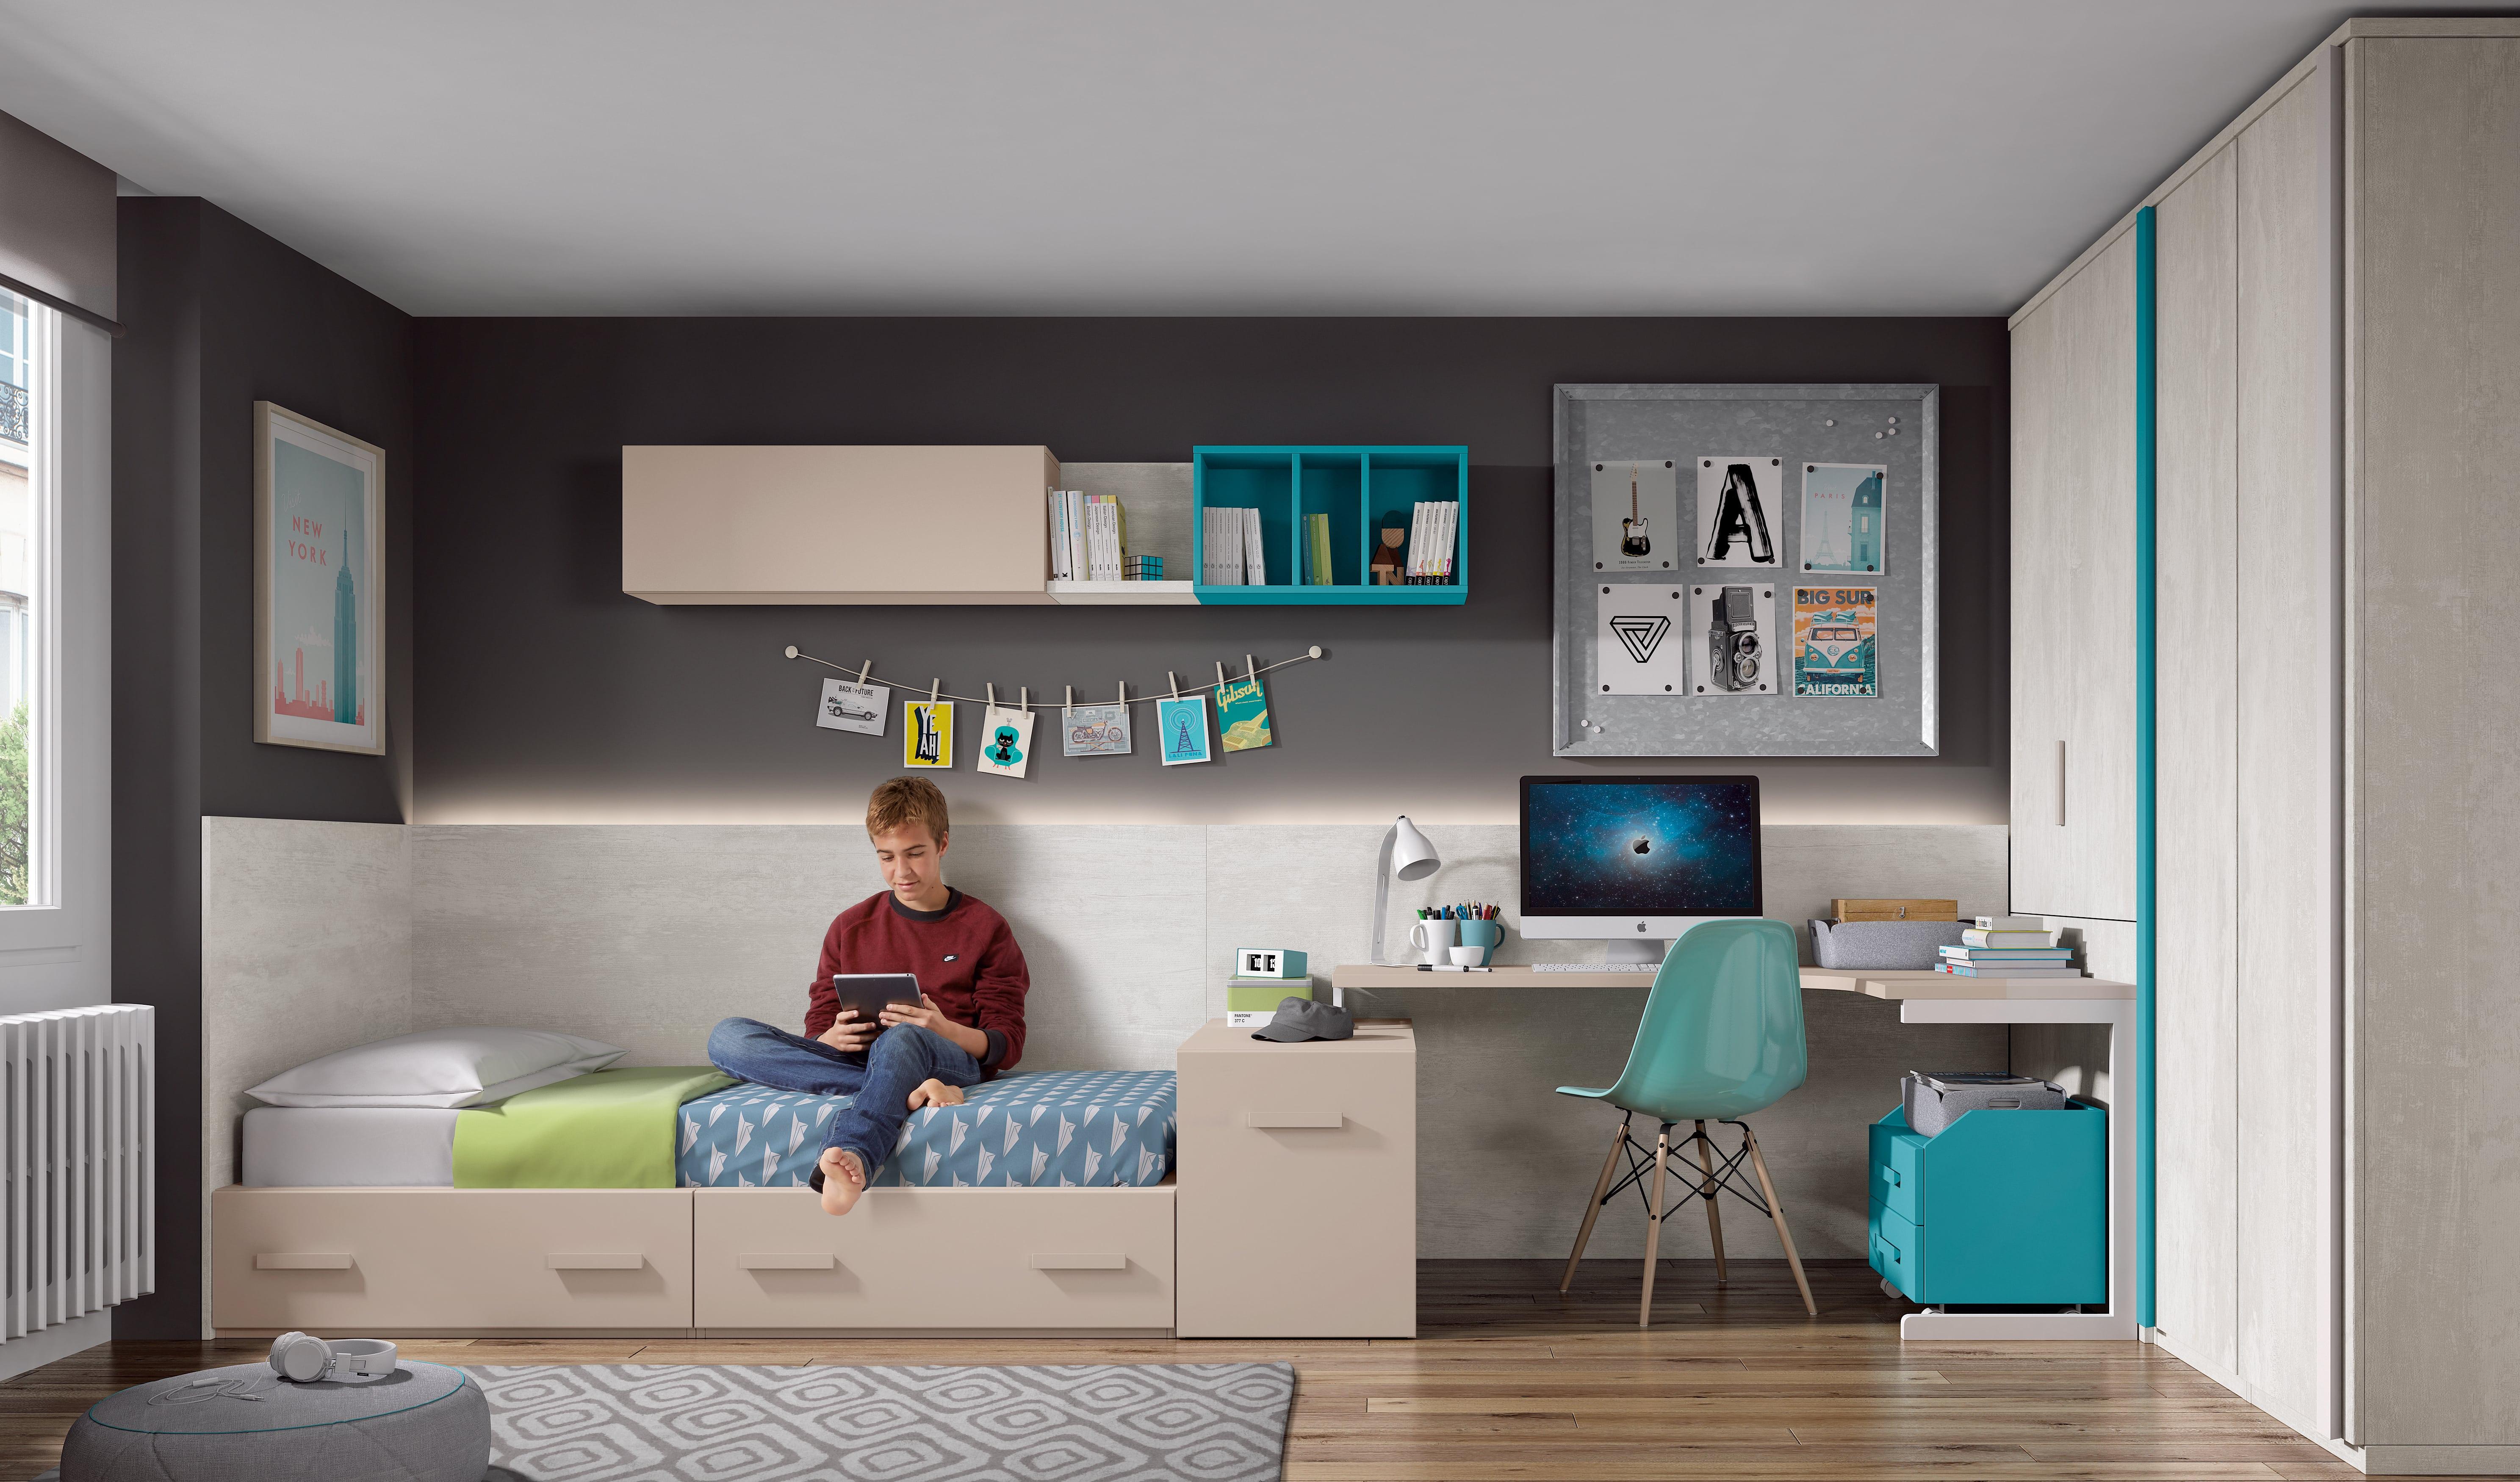 nidos-Happy-2018-muebles-paco-caballero-530-5c9299845b609